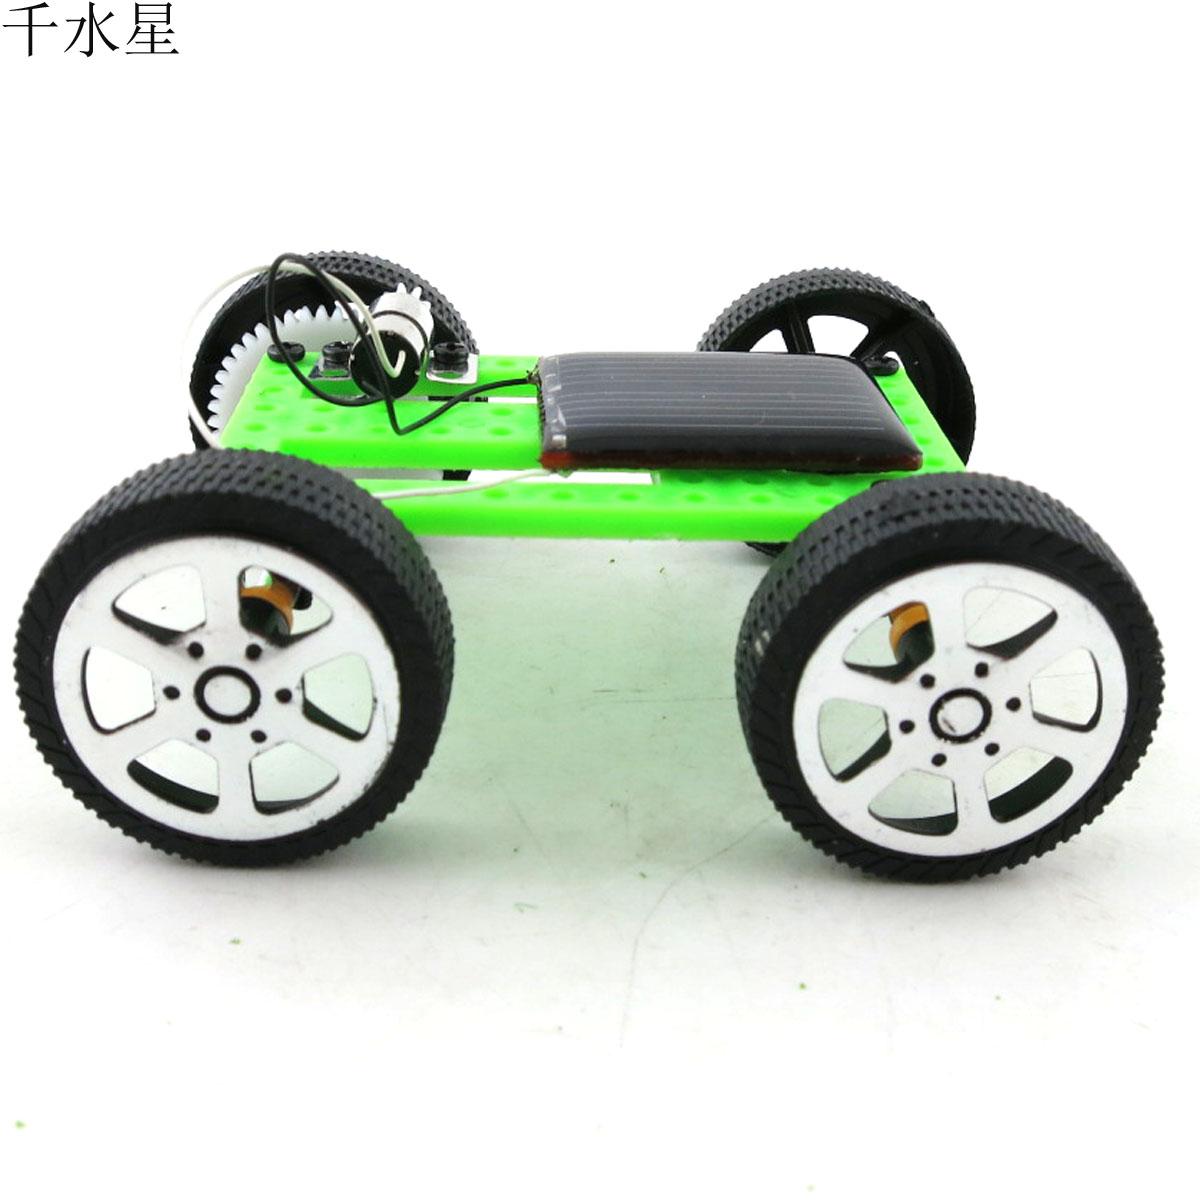 RU Solar model car, DIY production, interesting invention, model car ...